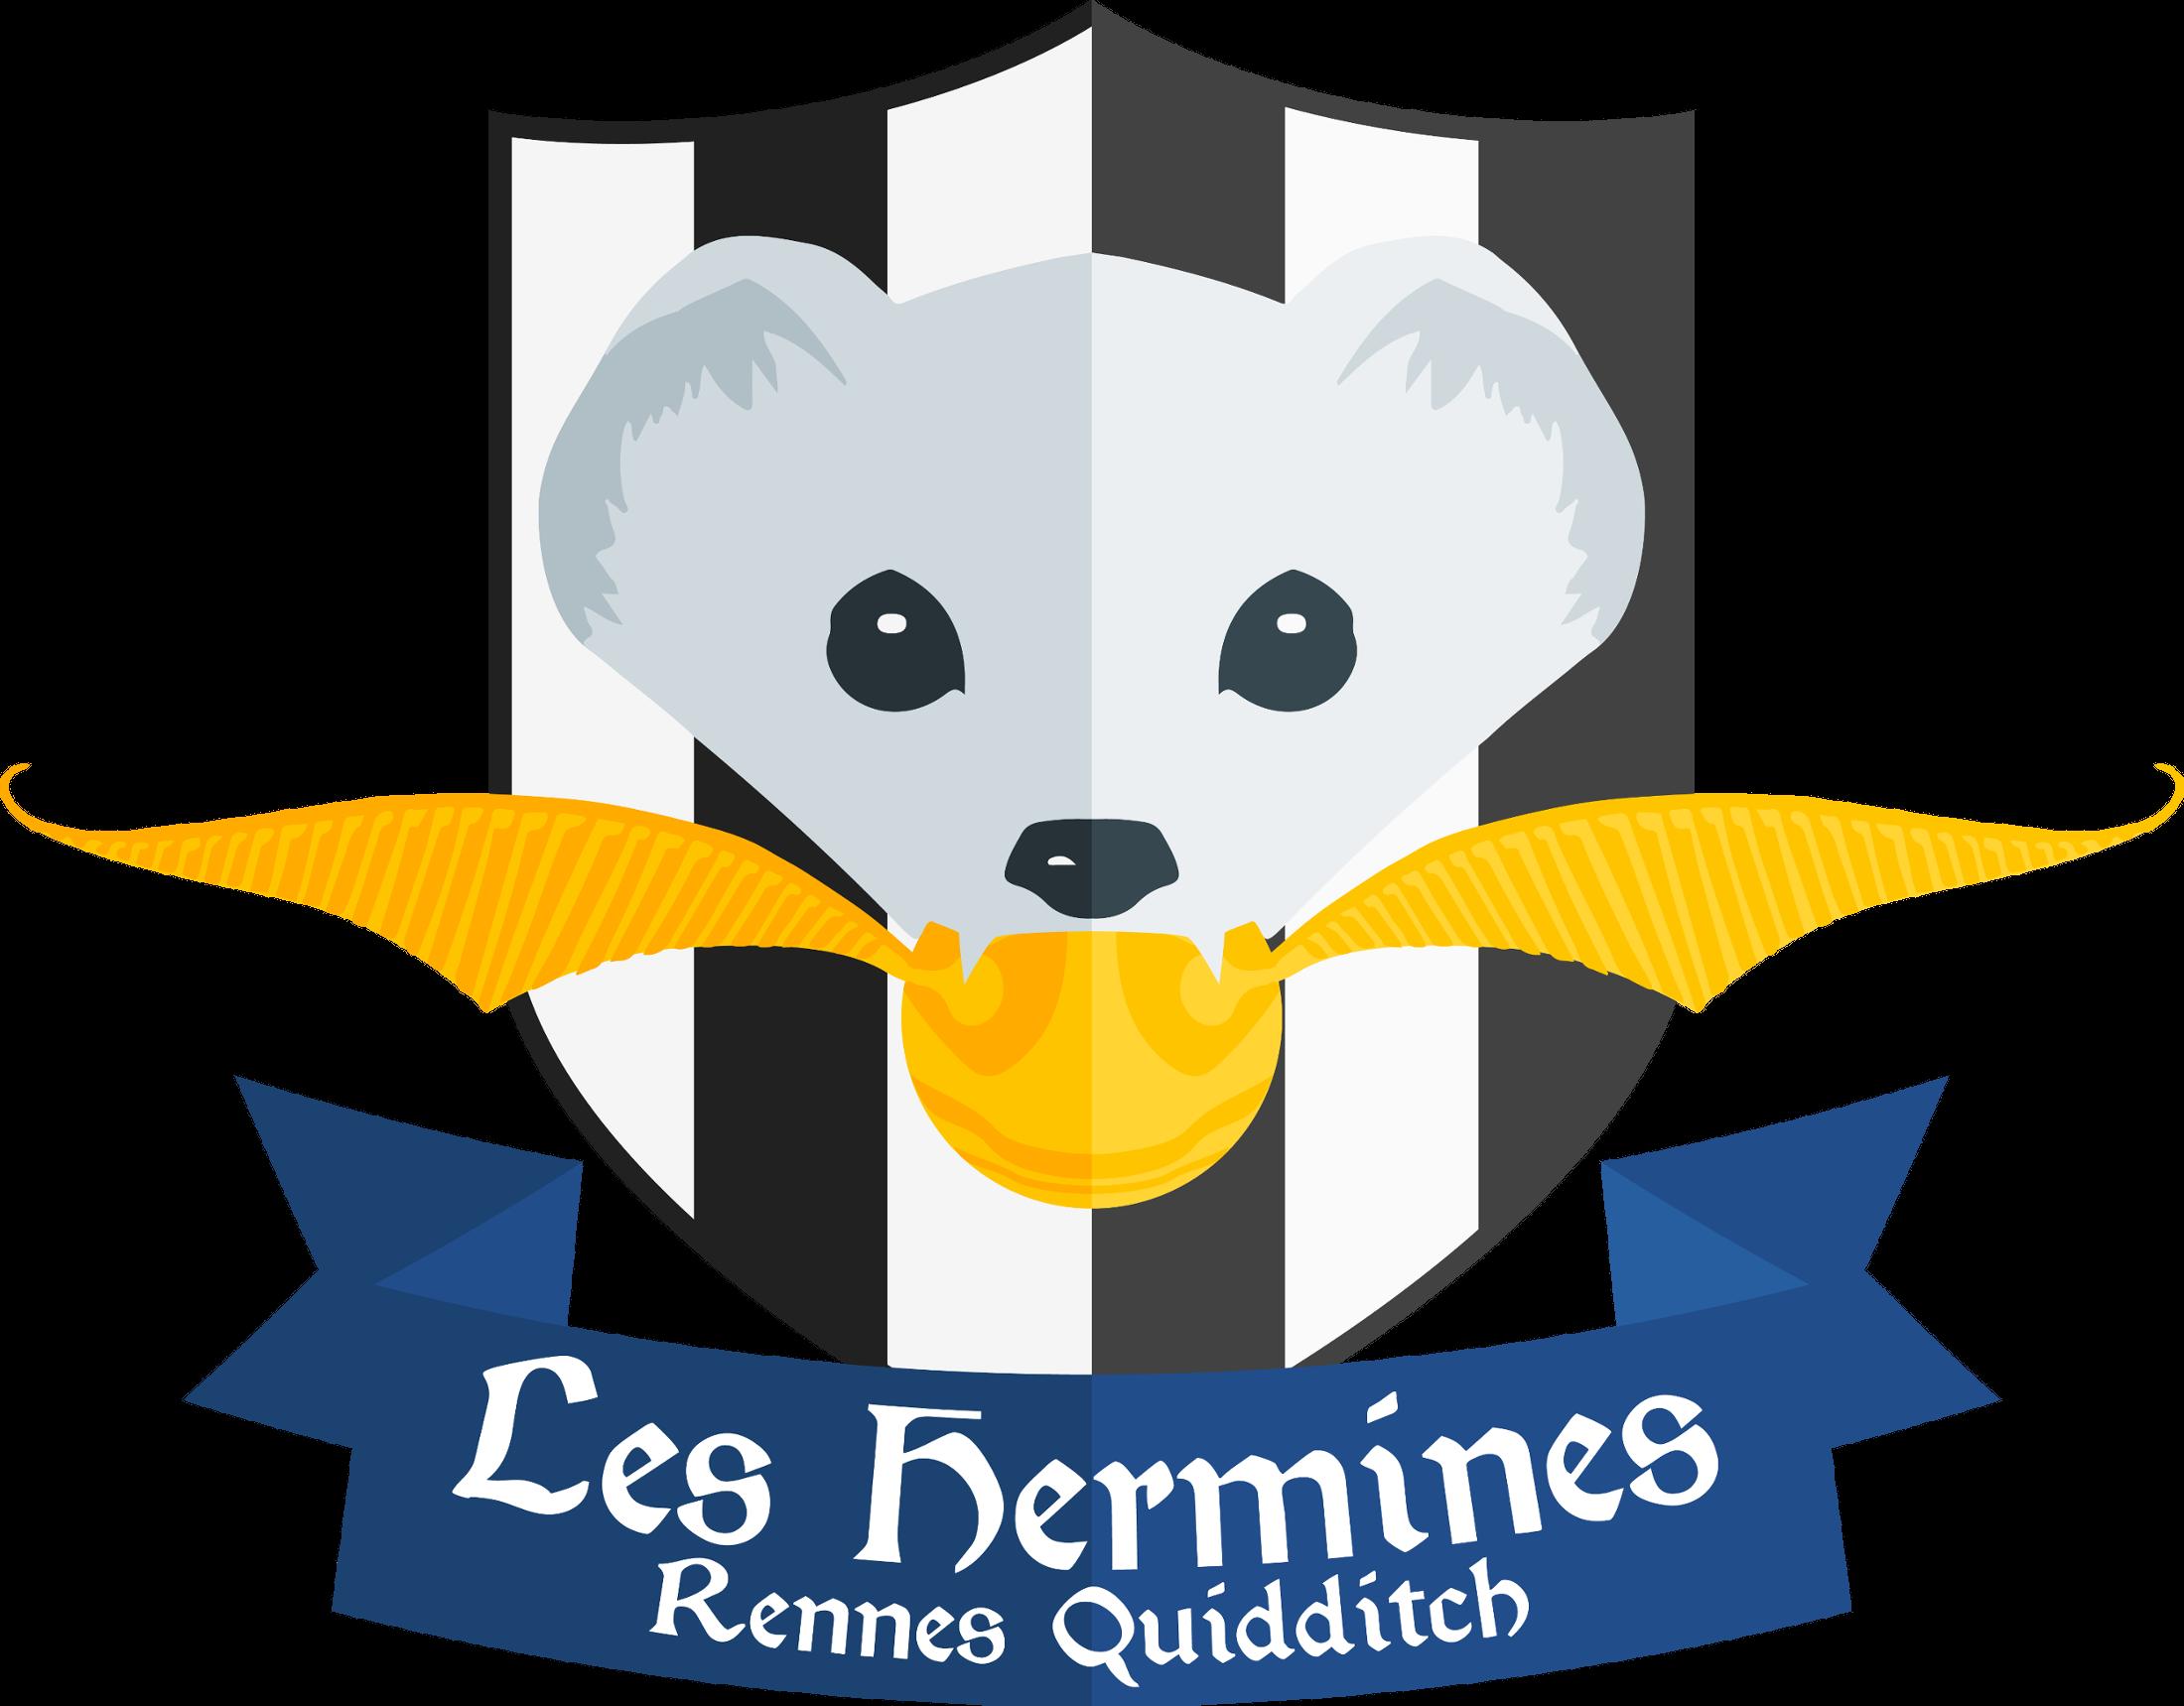 Les Hermines de Rennes Quidditch